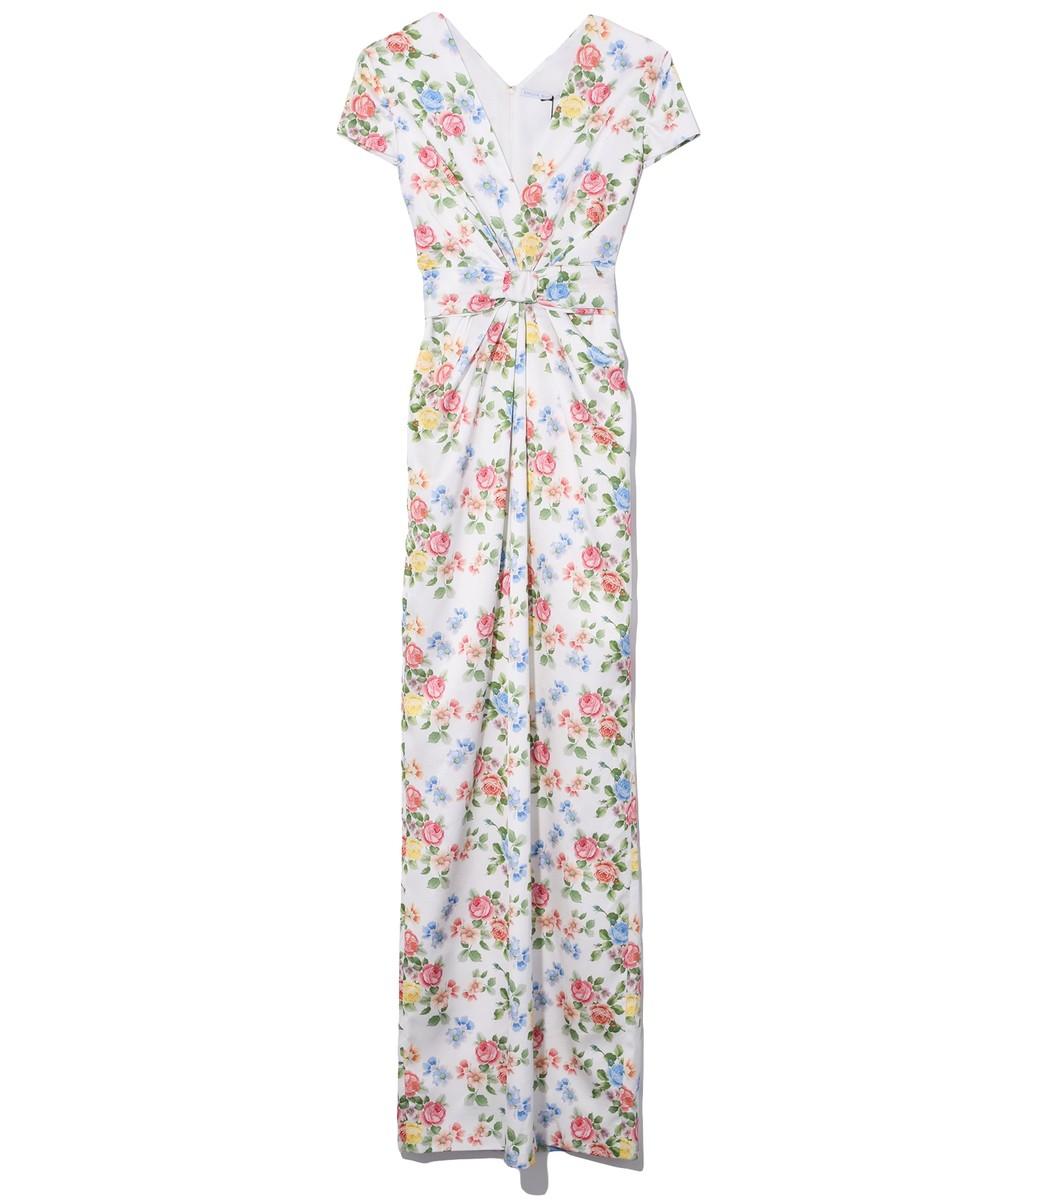 Emilia Wickstead Beatrice Dress in Soft Roses